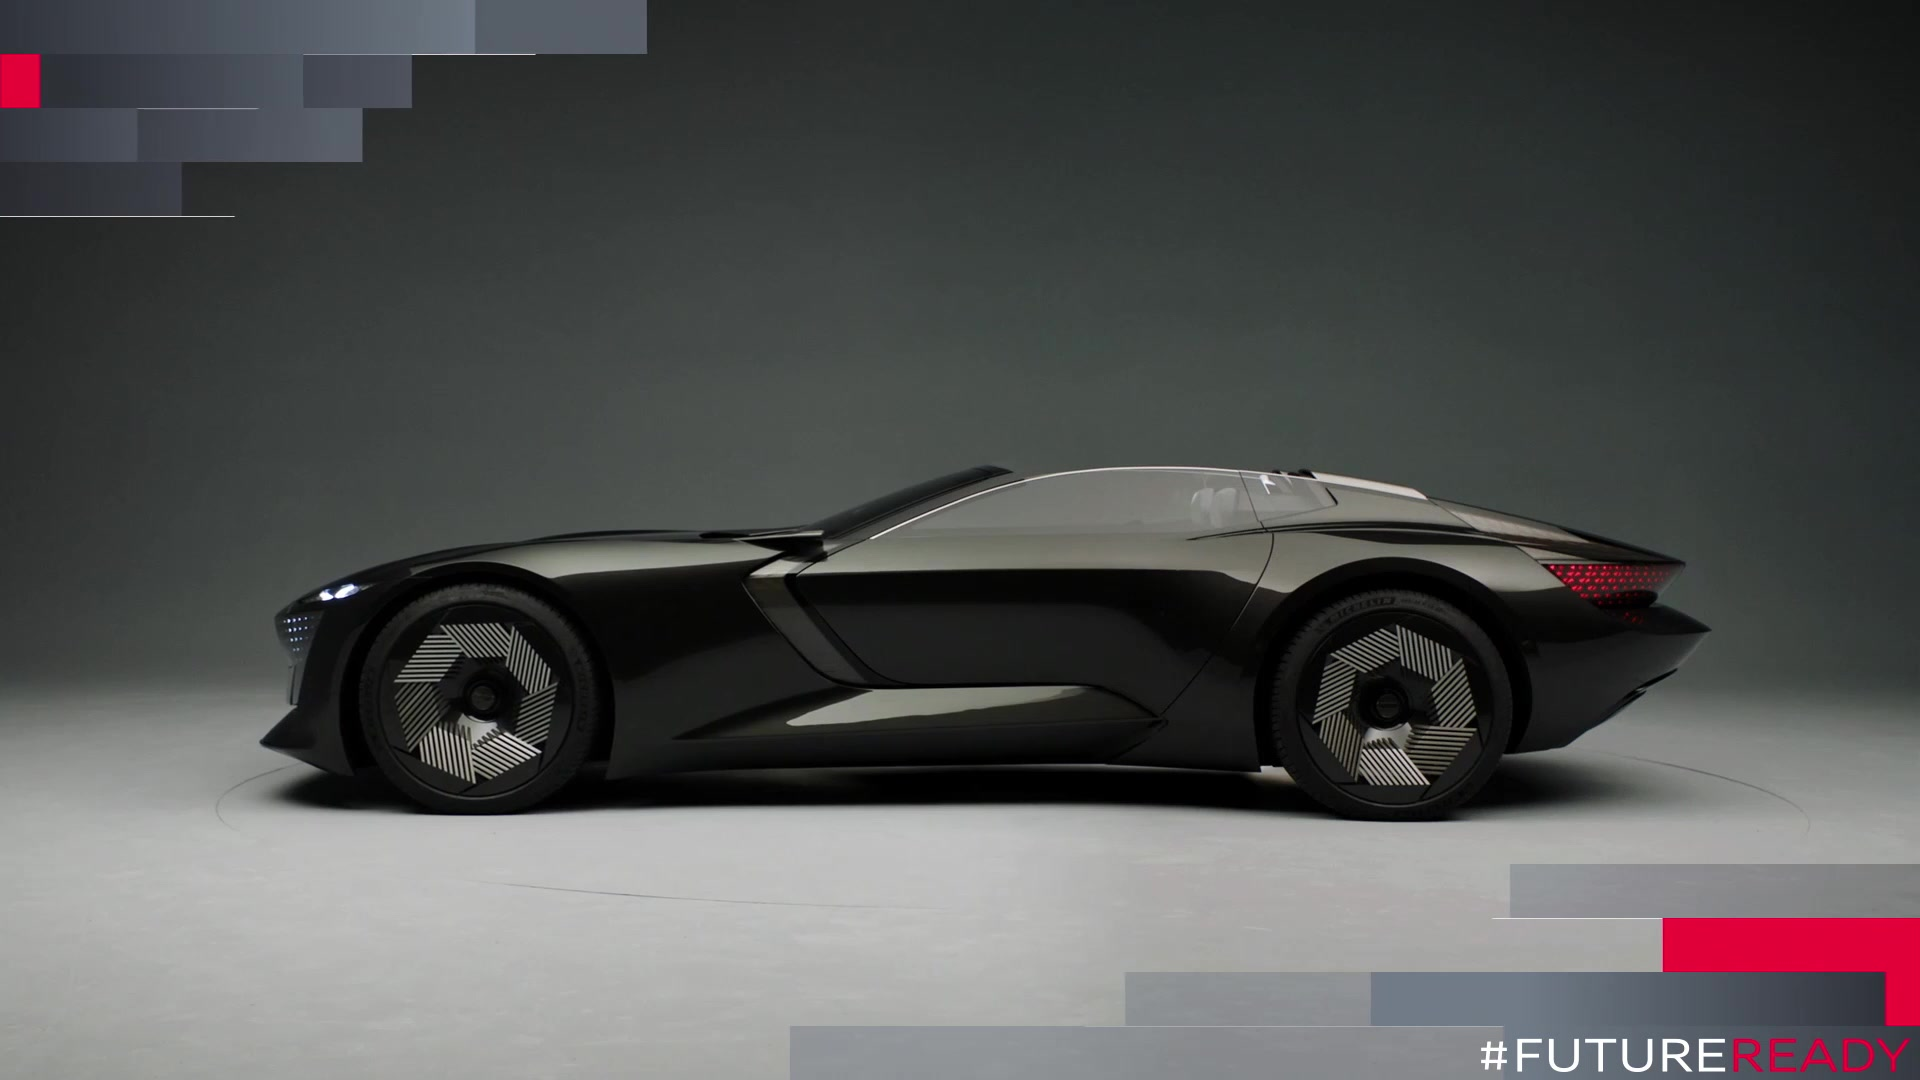 Audi Media Days – Audi future & grandsphere concept